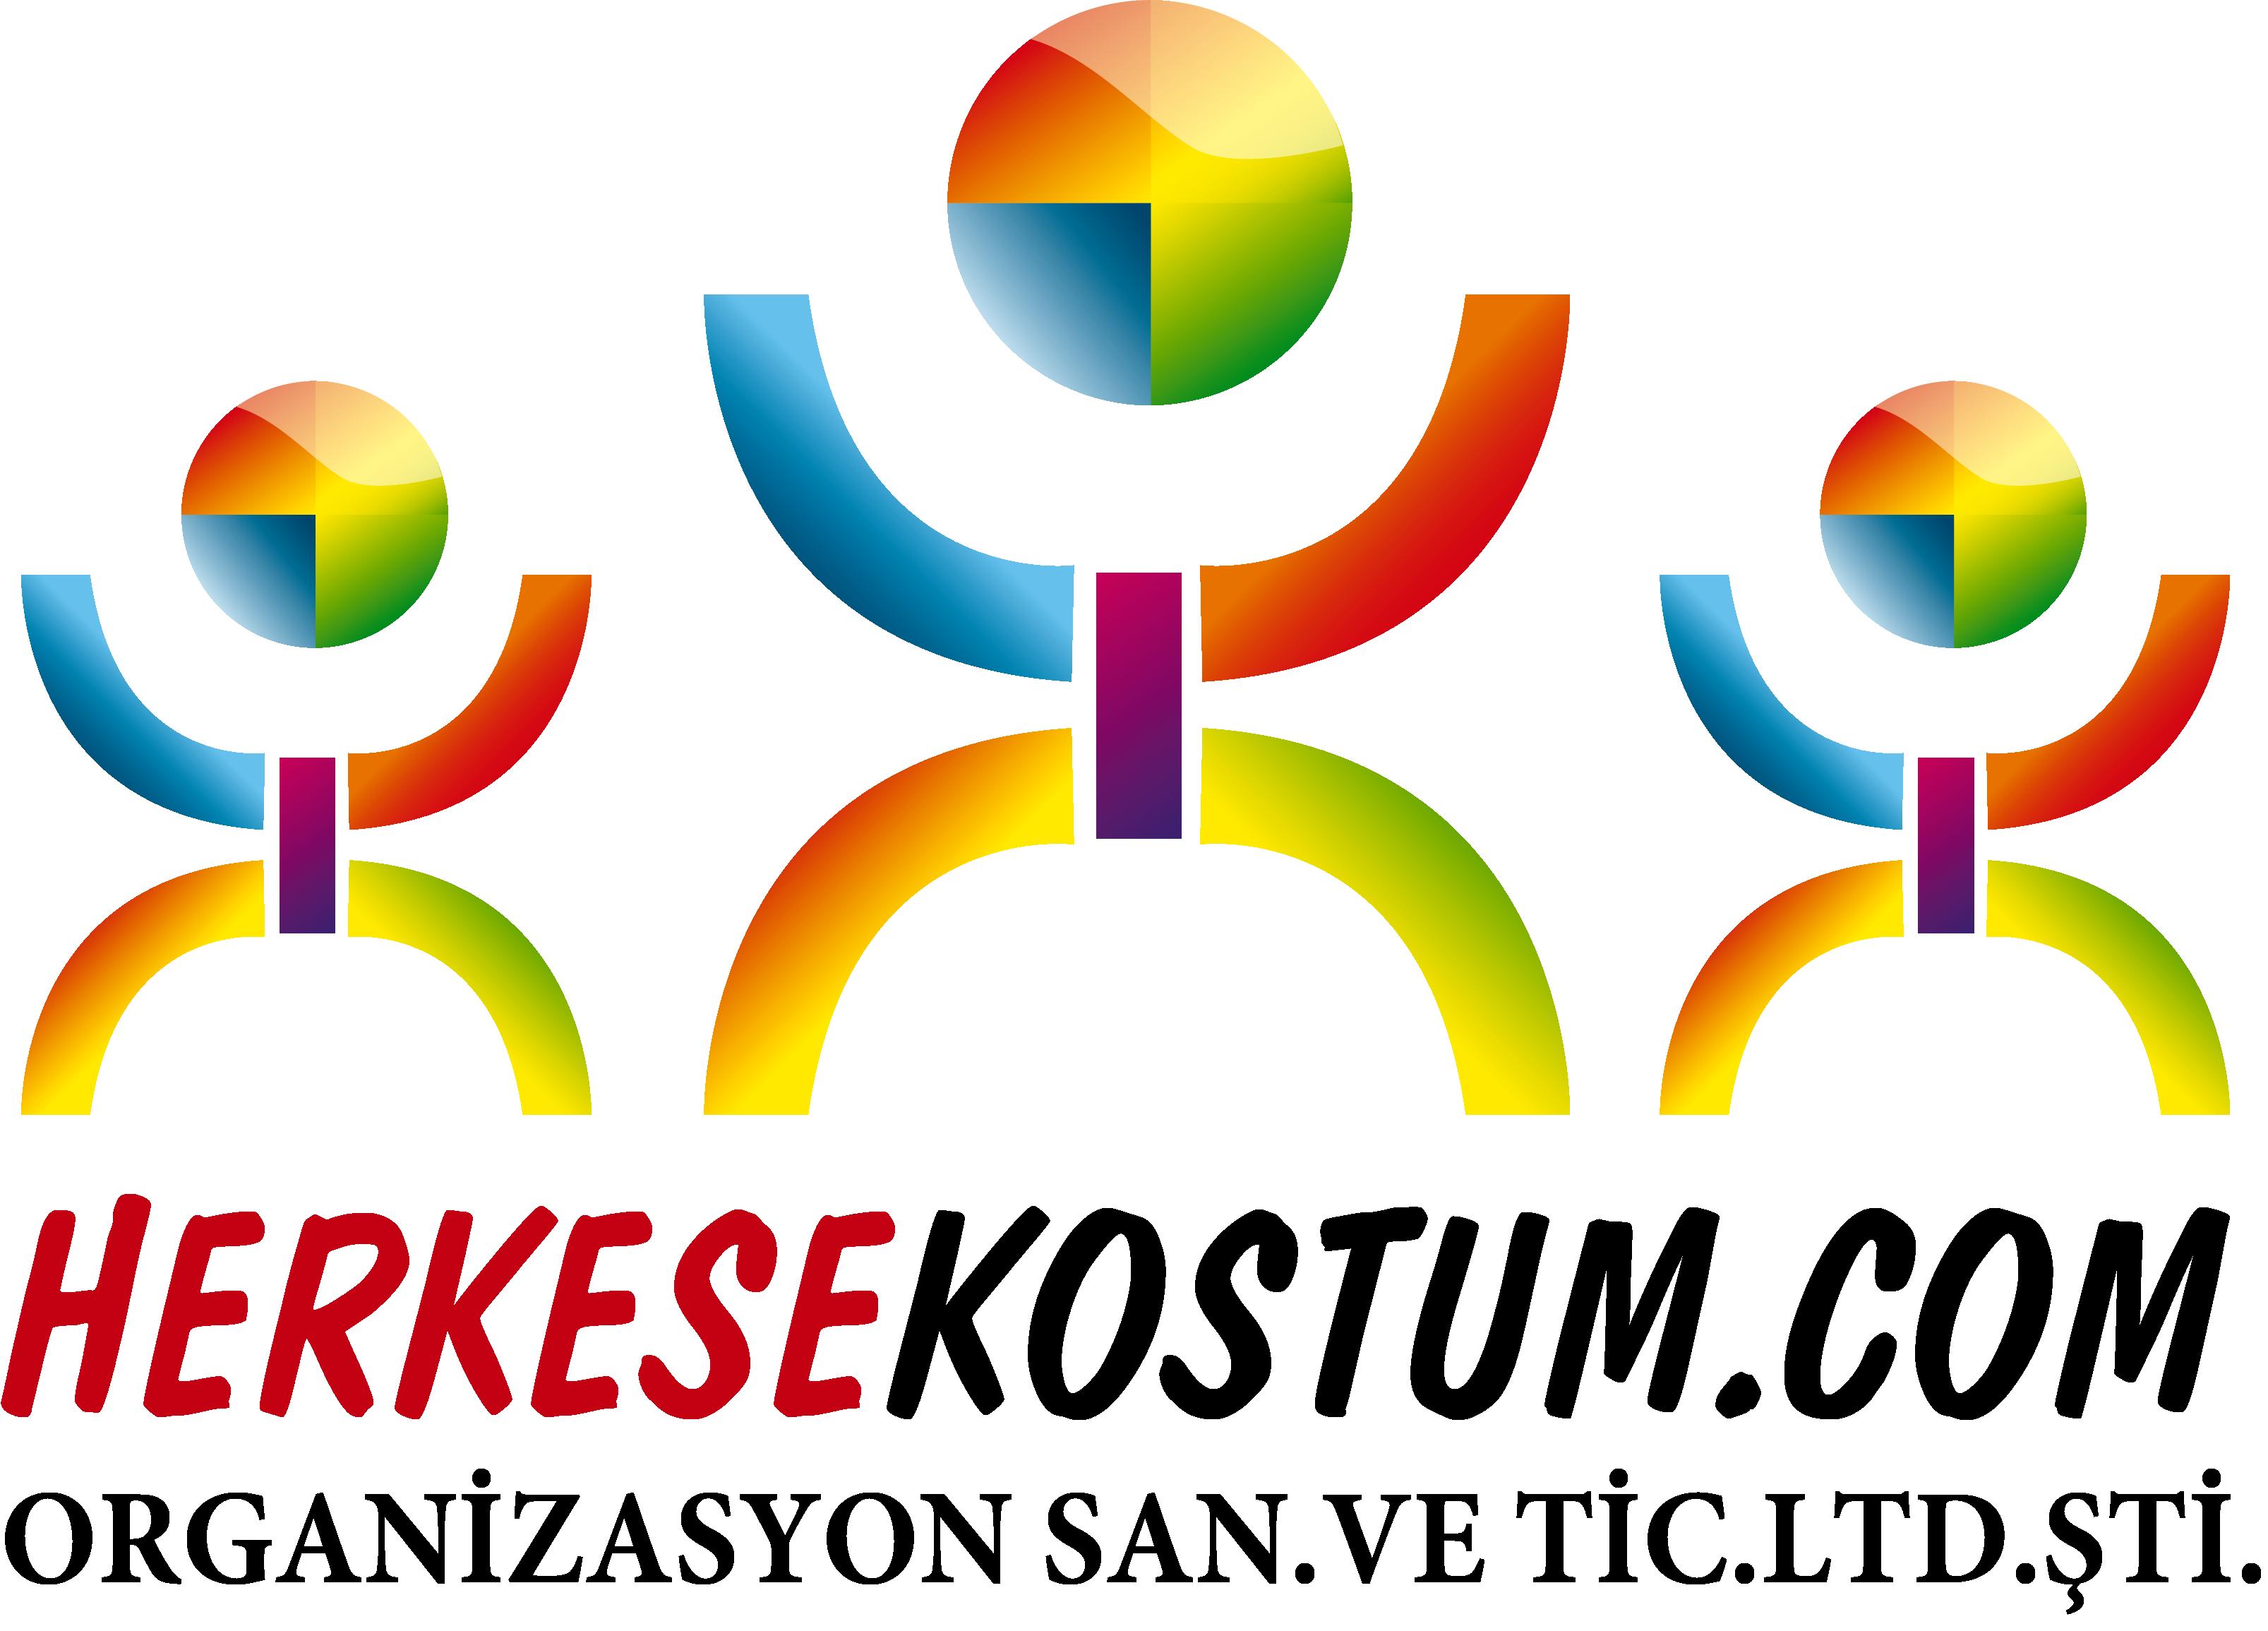 https://www.herkesekostum.com/